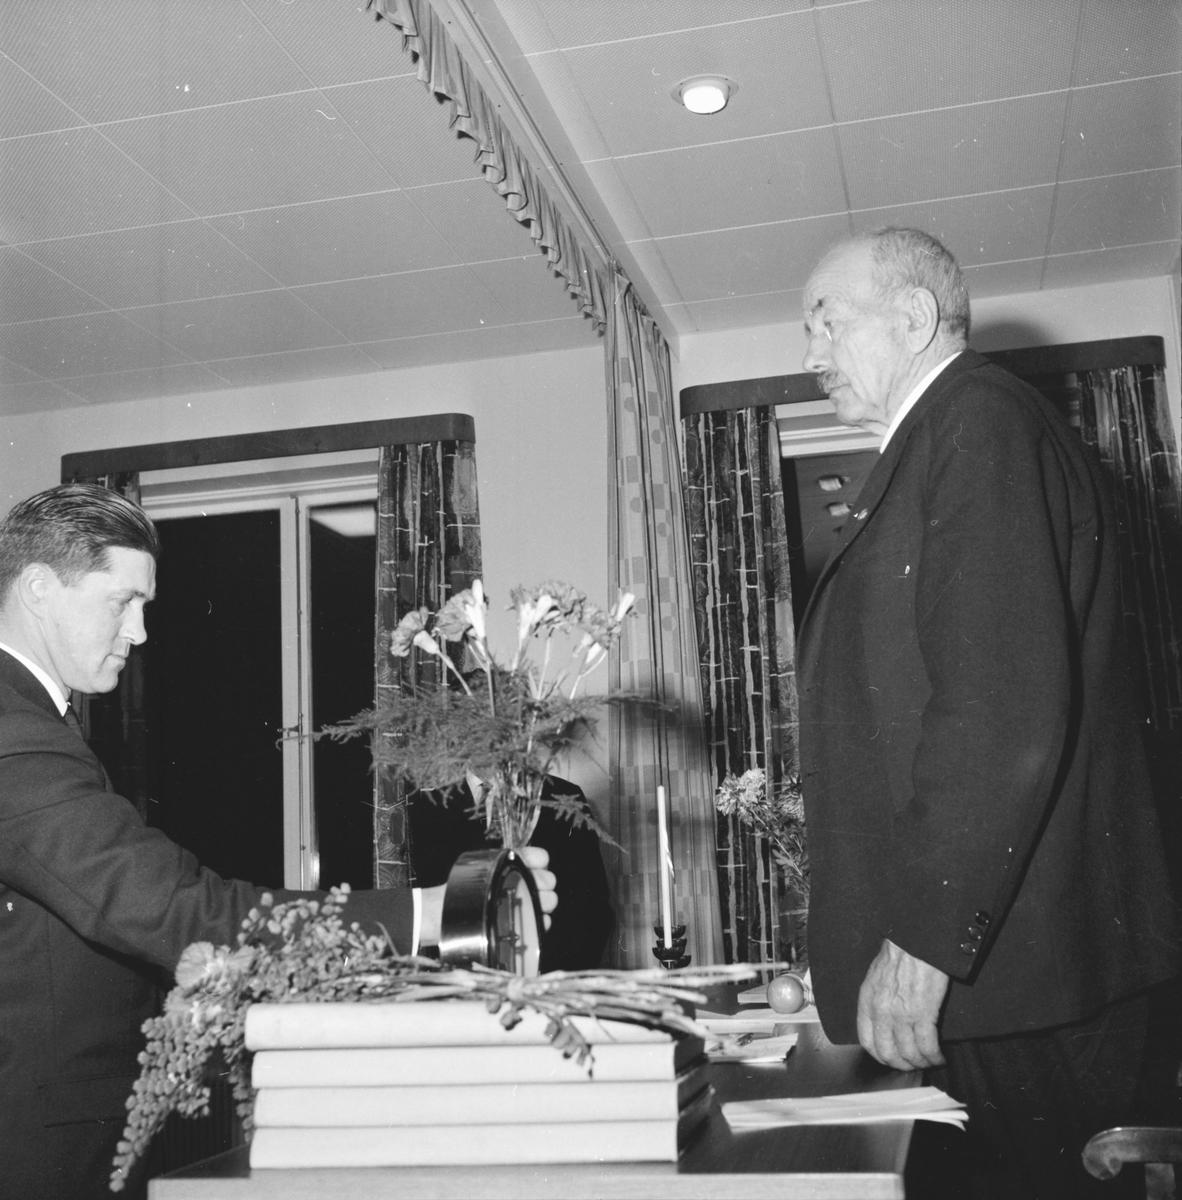 Komm.Fullm. David Petterssons farväl, Skog. 15 dec. 1962